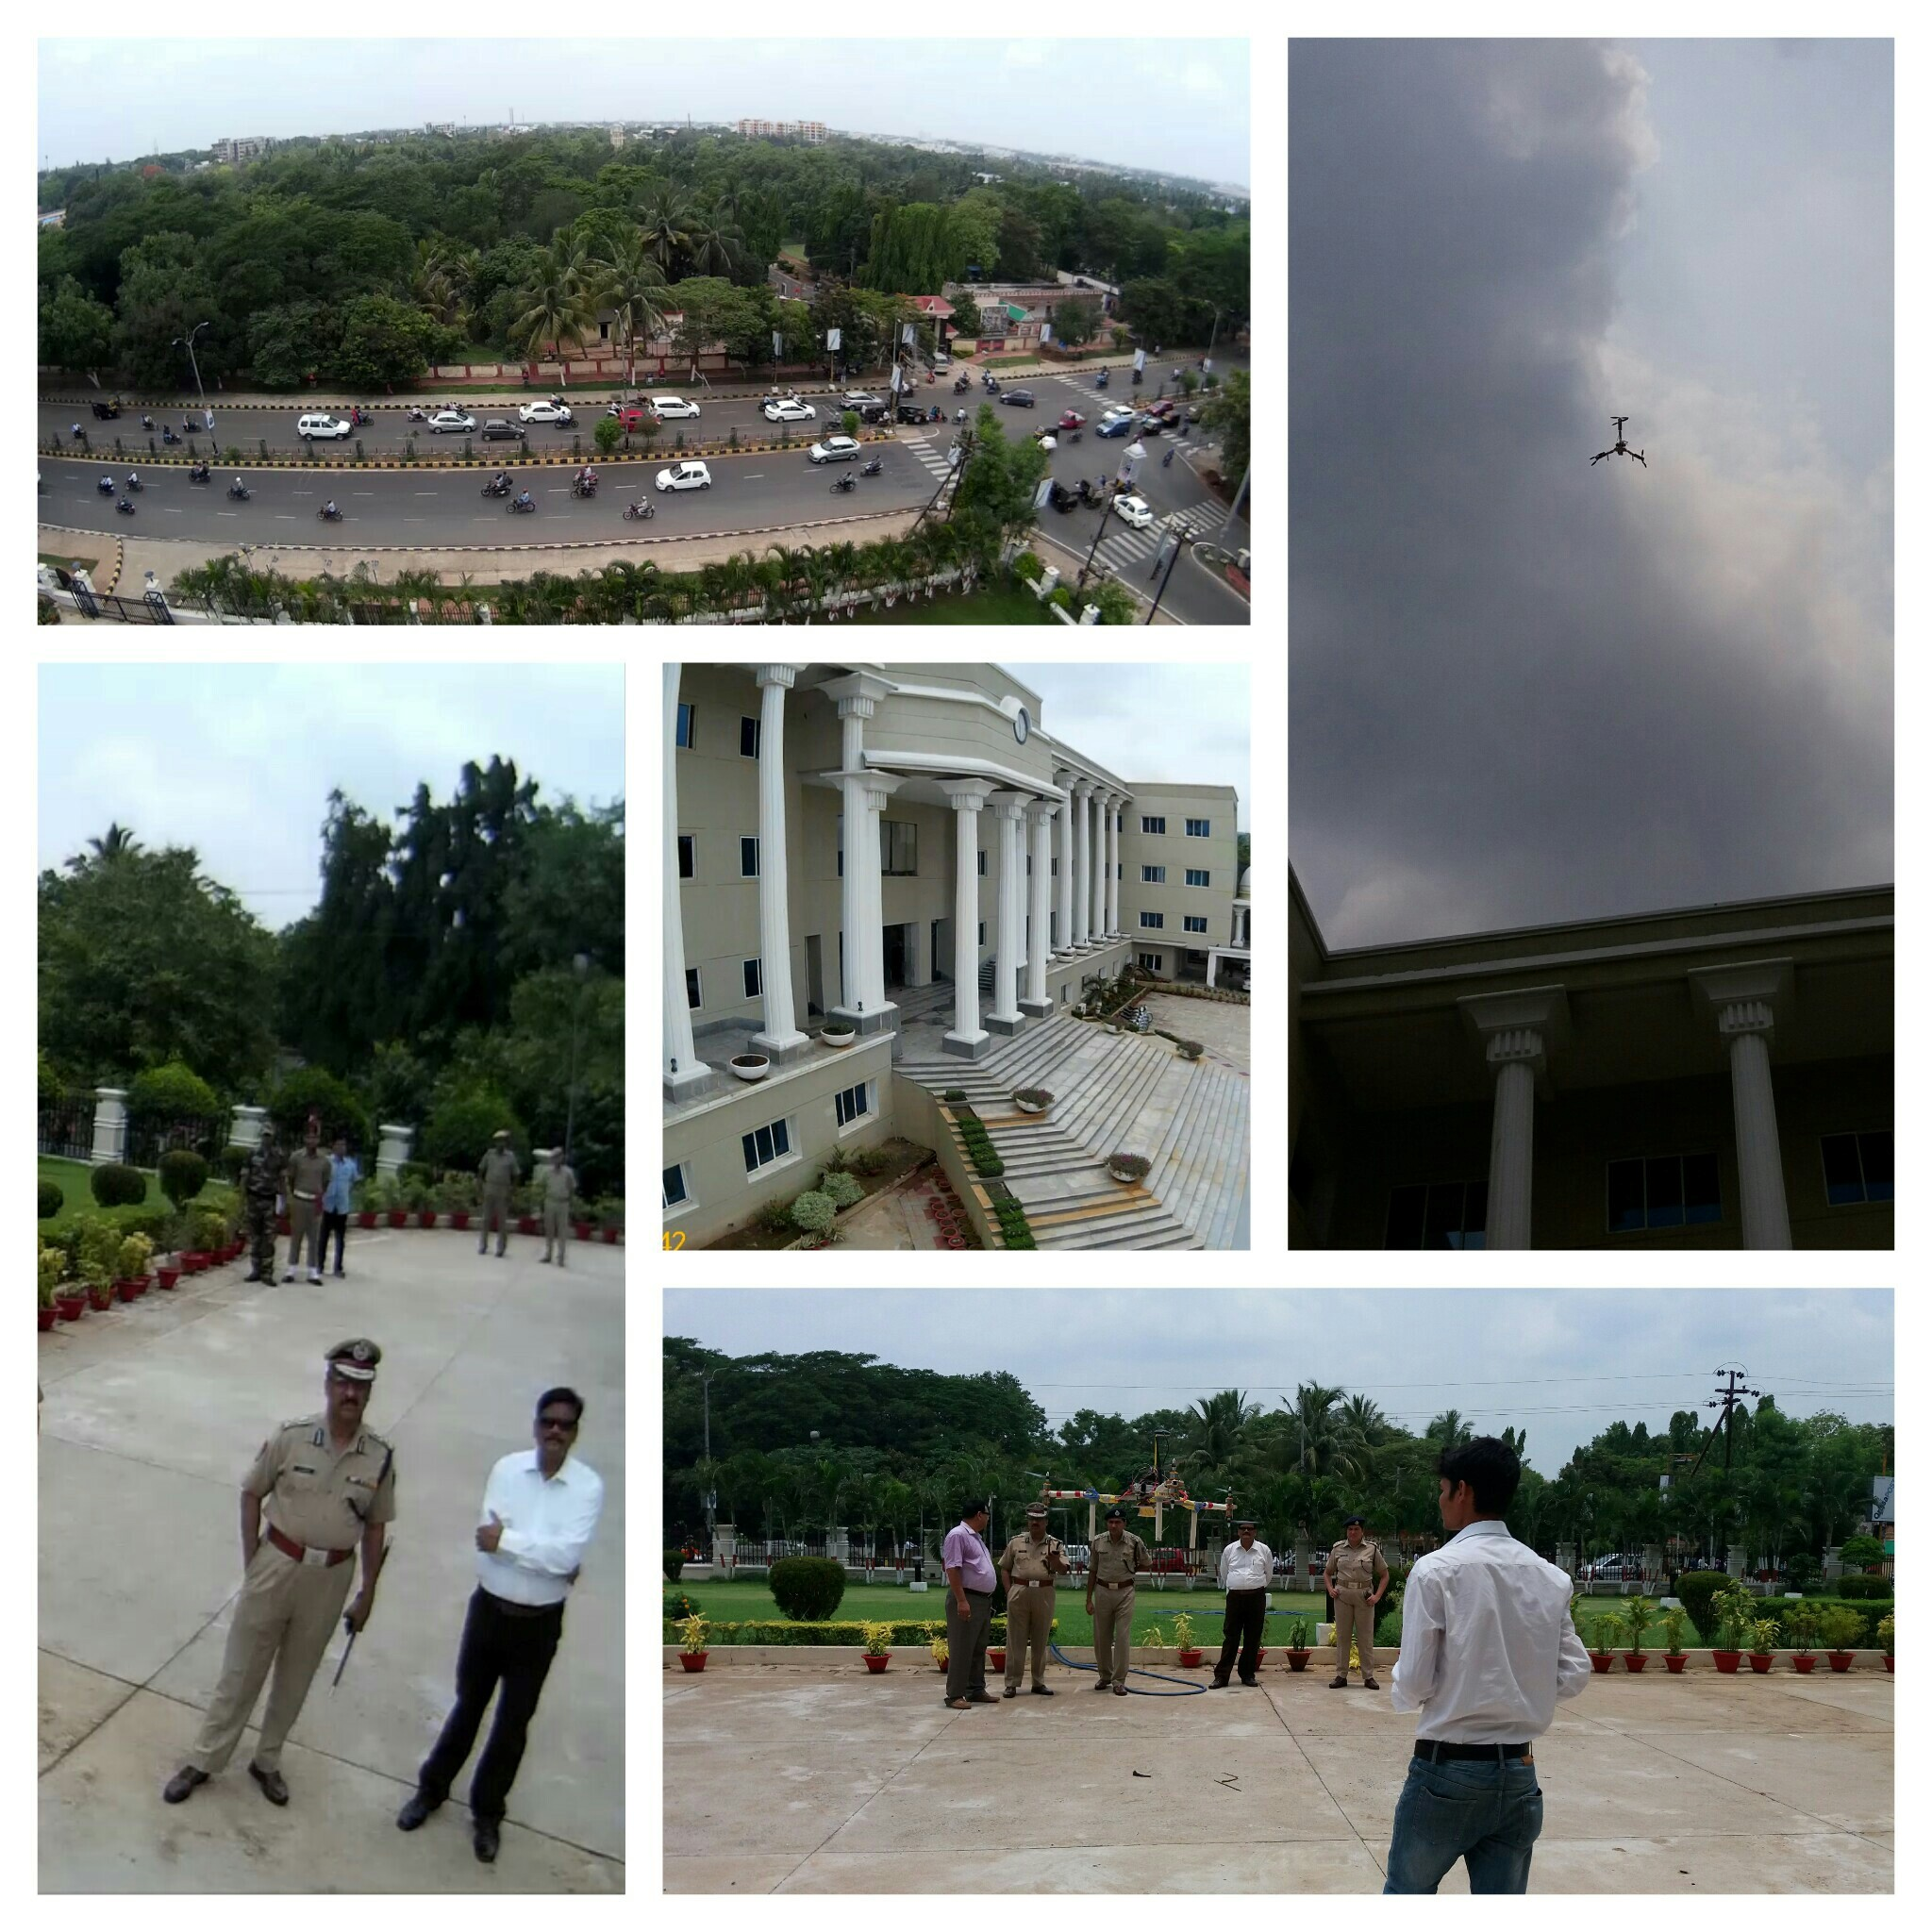 Firewings Drone bhubaneswar buzz 1